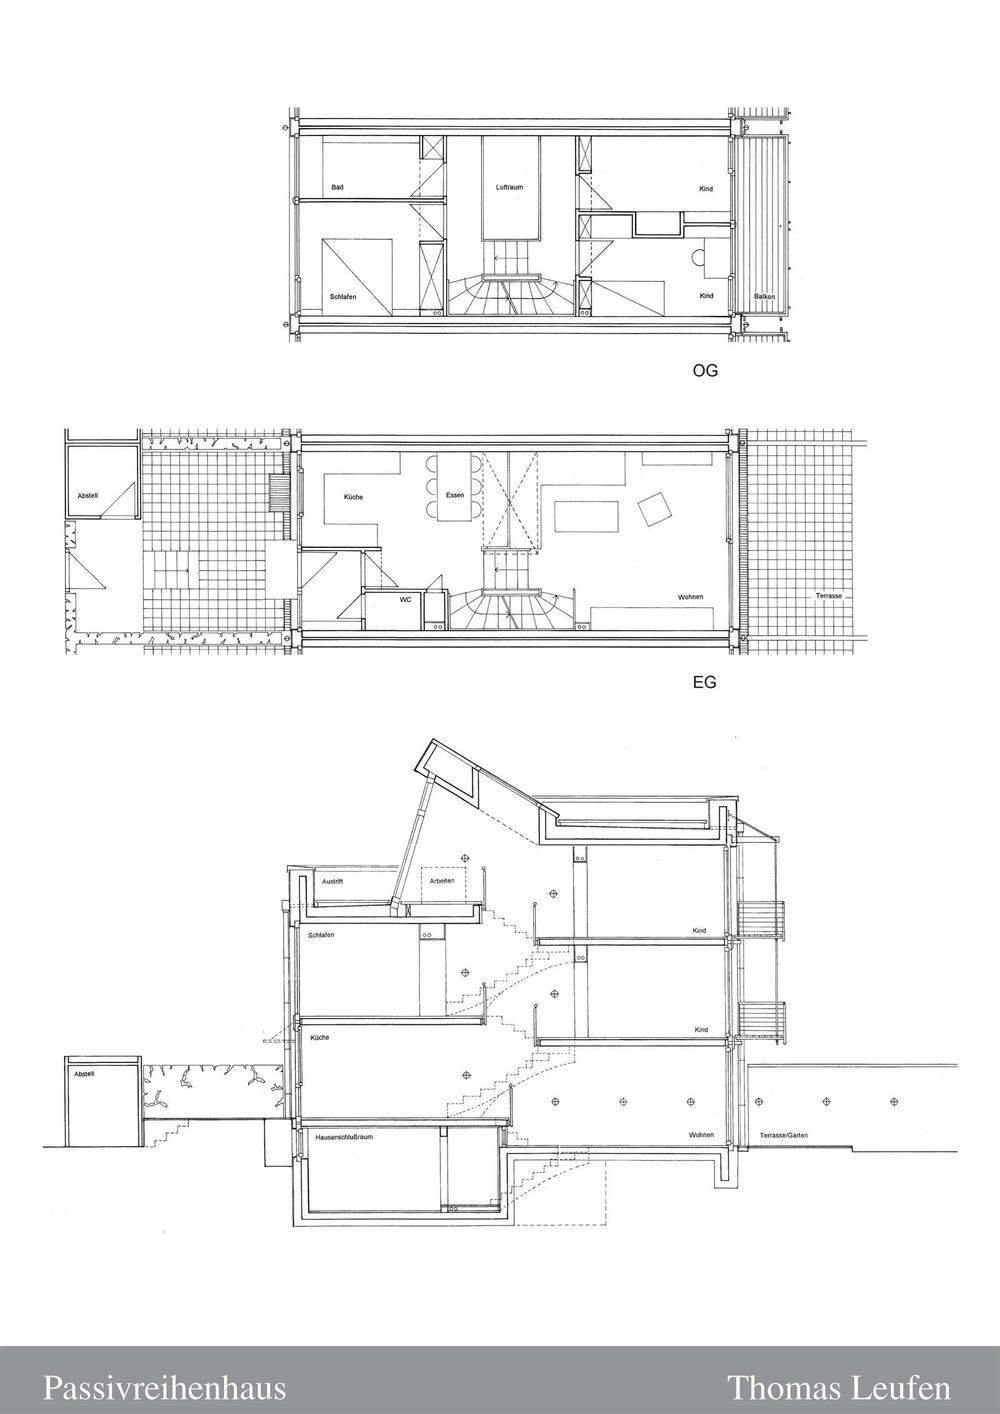 maison passive passivhaus tom thomas leufen architekt architecte luxemburg luxembourg